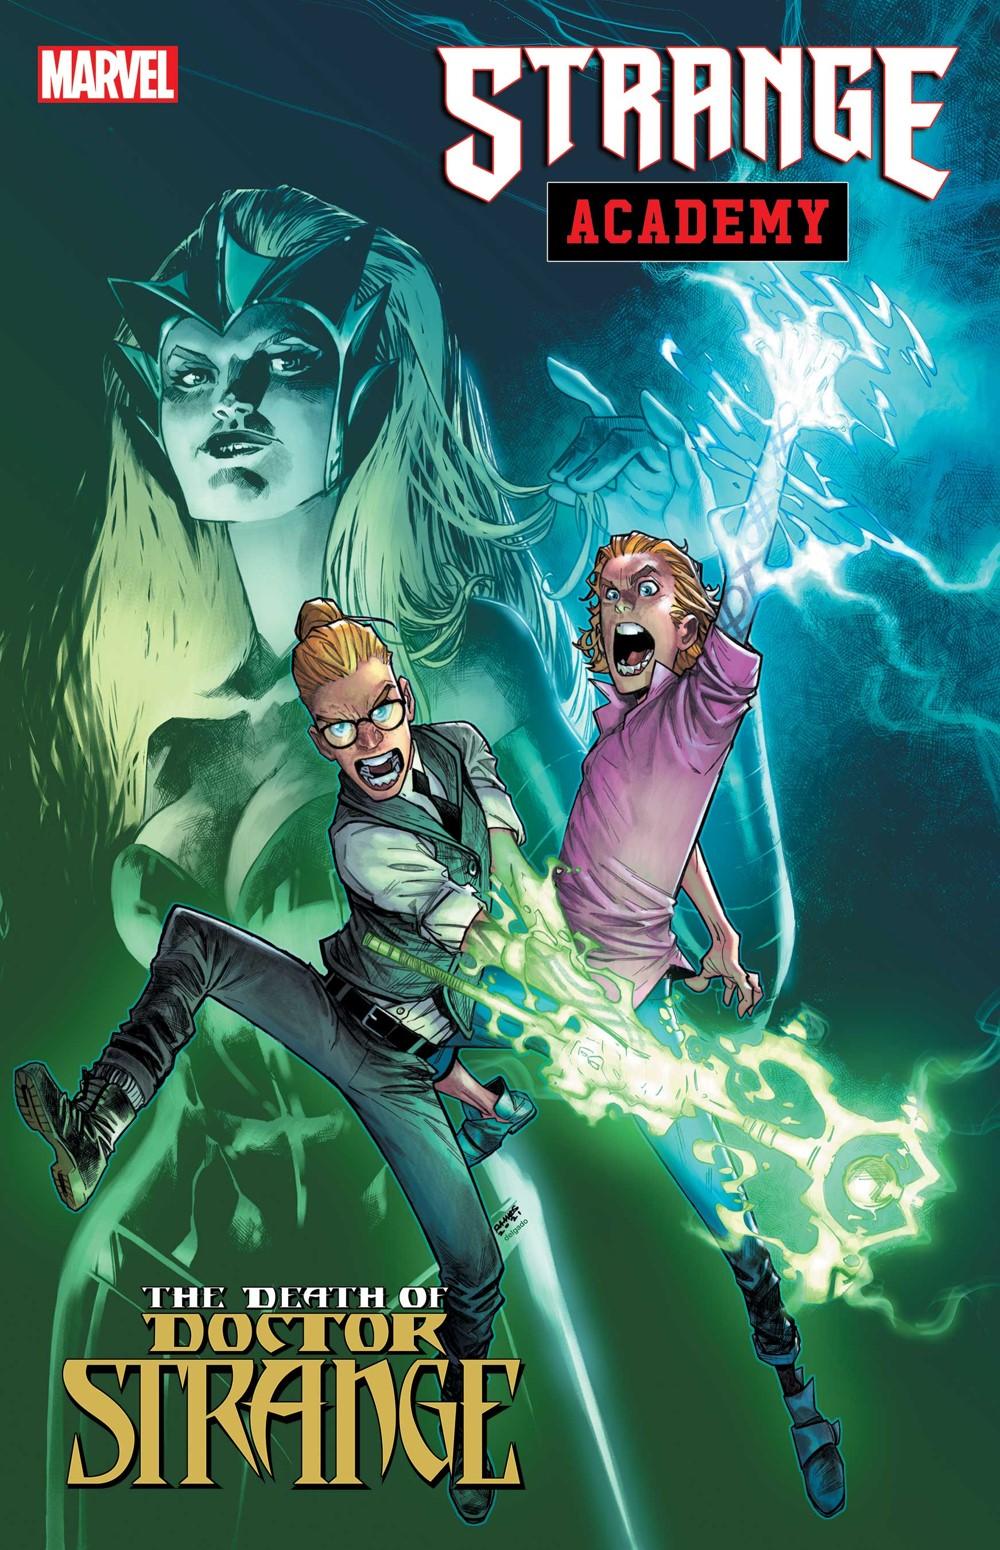 STRANGE_ACADEMY_DRSTDEATH Marvel Comics October 2021 Solicitations